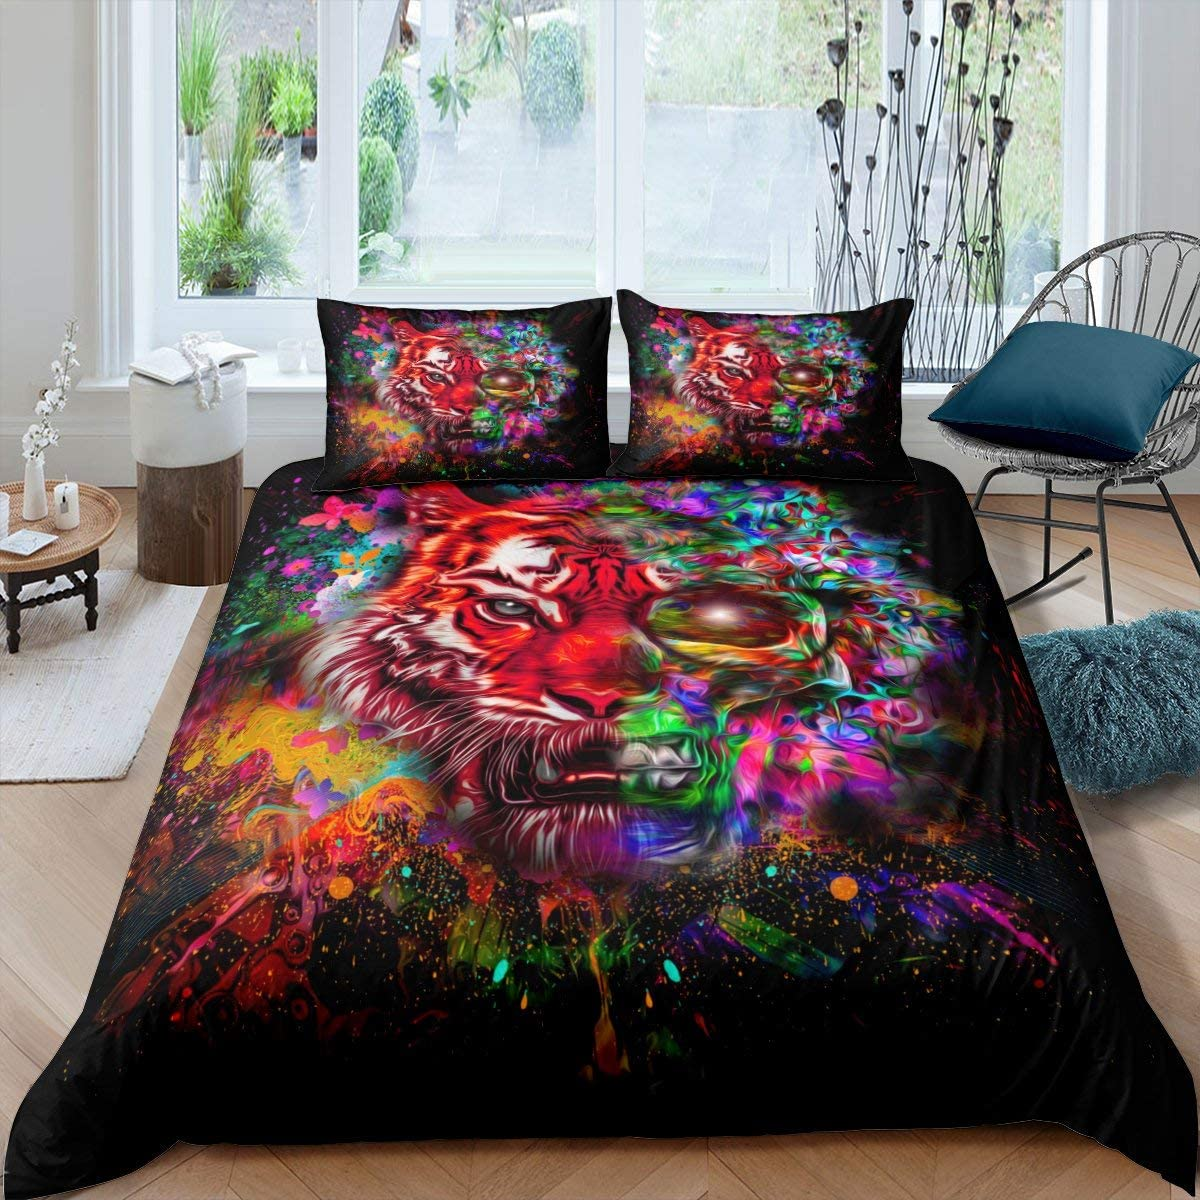 Erosebridal Tiger Comforter Cover, Trippy Iridescent African Wild Feline Carnivorous Animal Grunge Tie Dye Graffiti Duvet Cover, Decorative 2 Piece Bedding Set with 1 Pillow Sham, Twin Size, Black